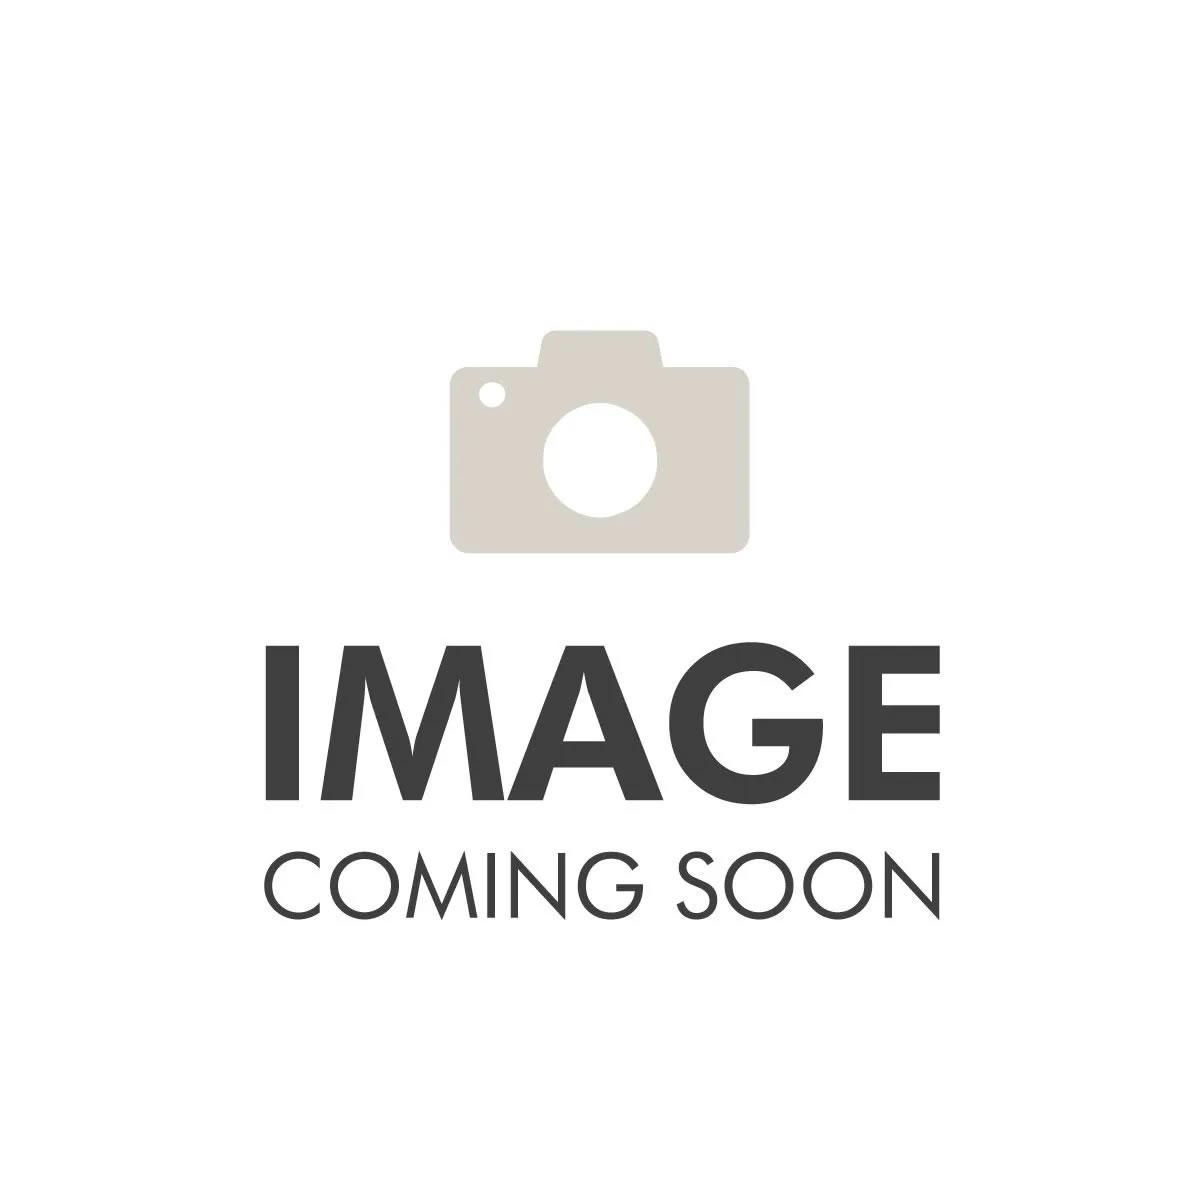 Fabric Seat Protectors, Black/Gray; 76-06 Jeep CJ/Wrangler YJ/TJ